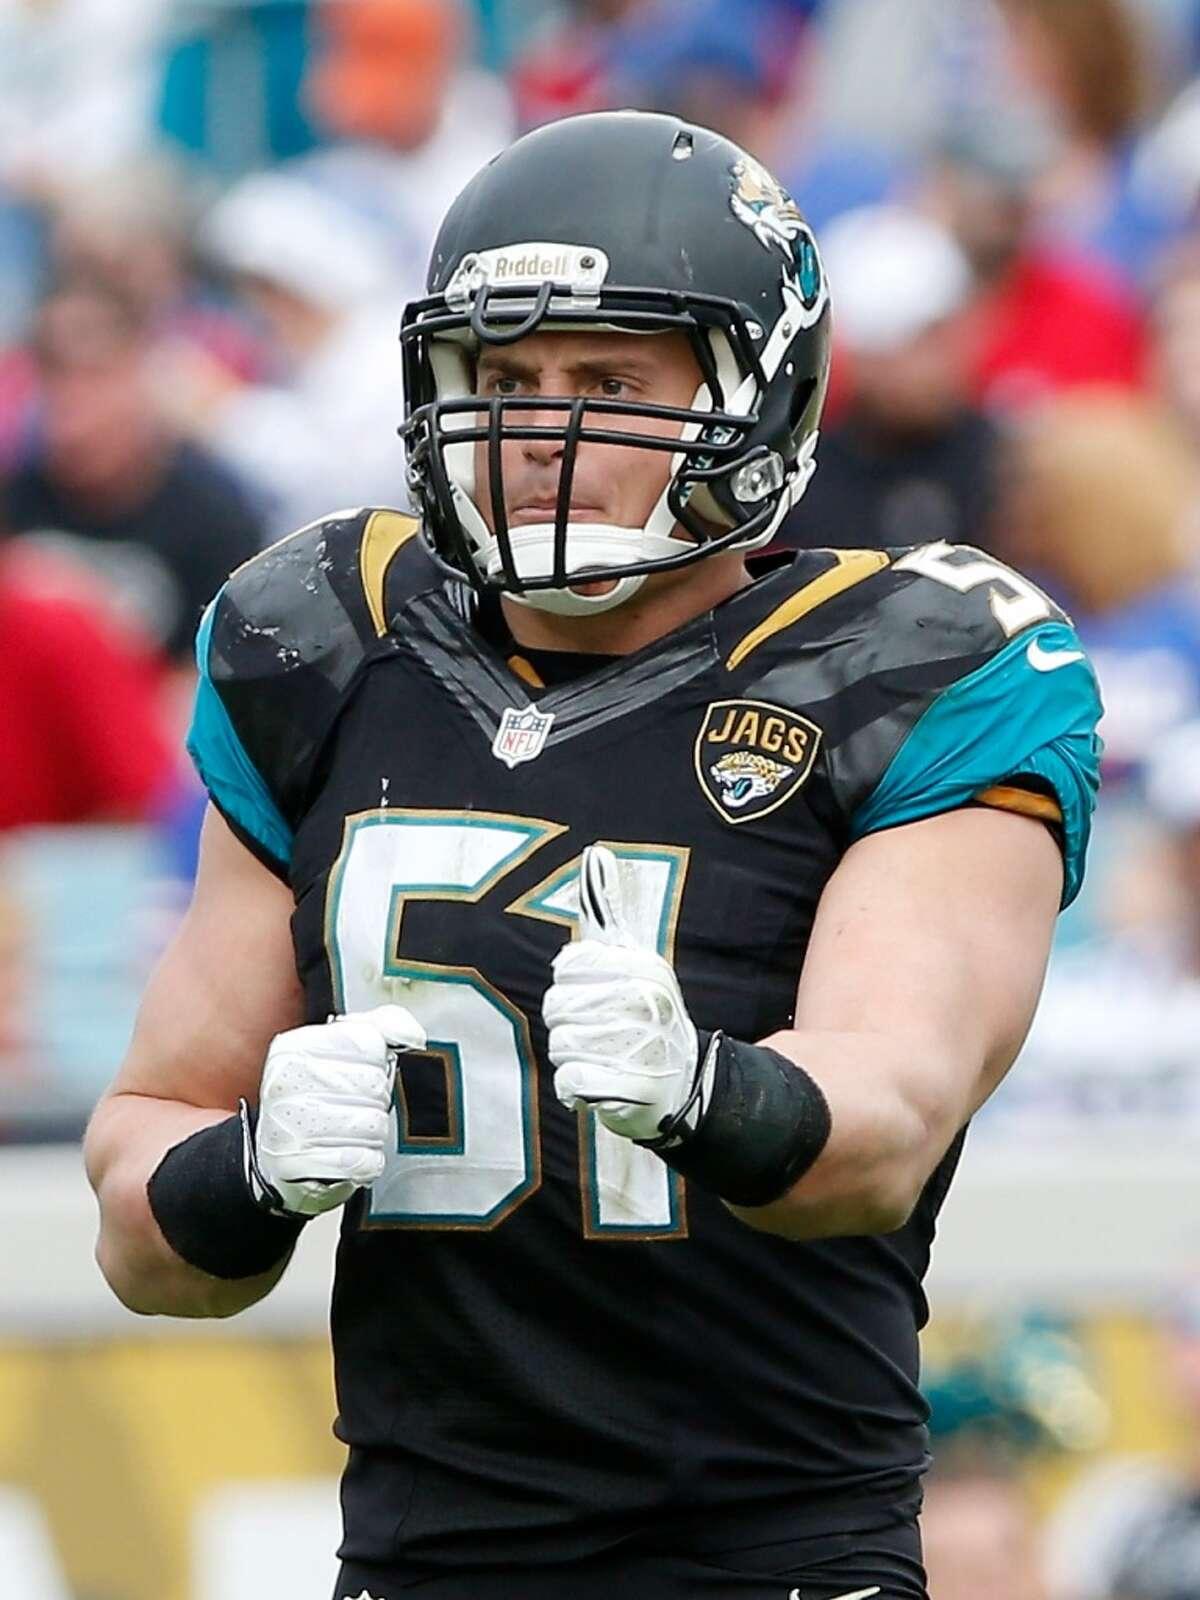 Inside linebacker - Paul Posluszny, Jacksonville Jaguars